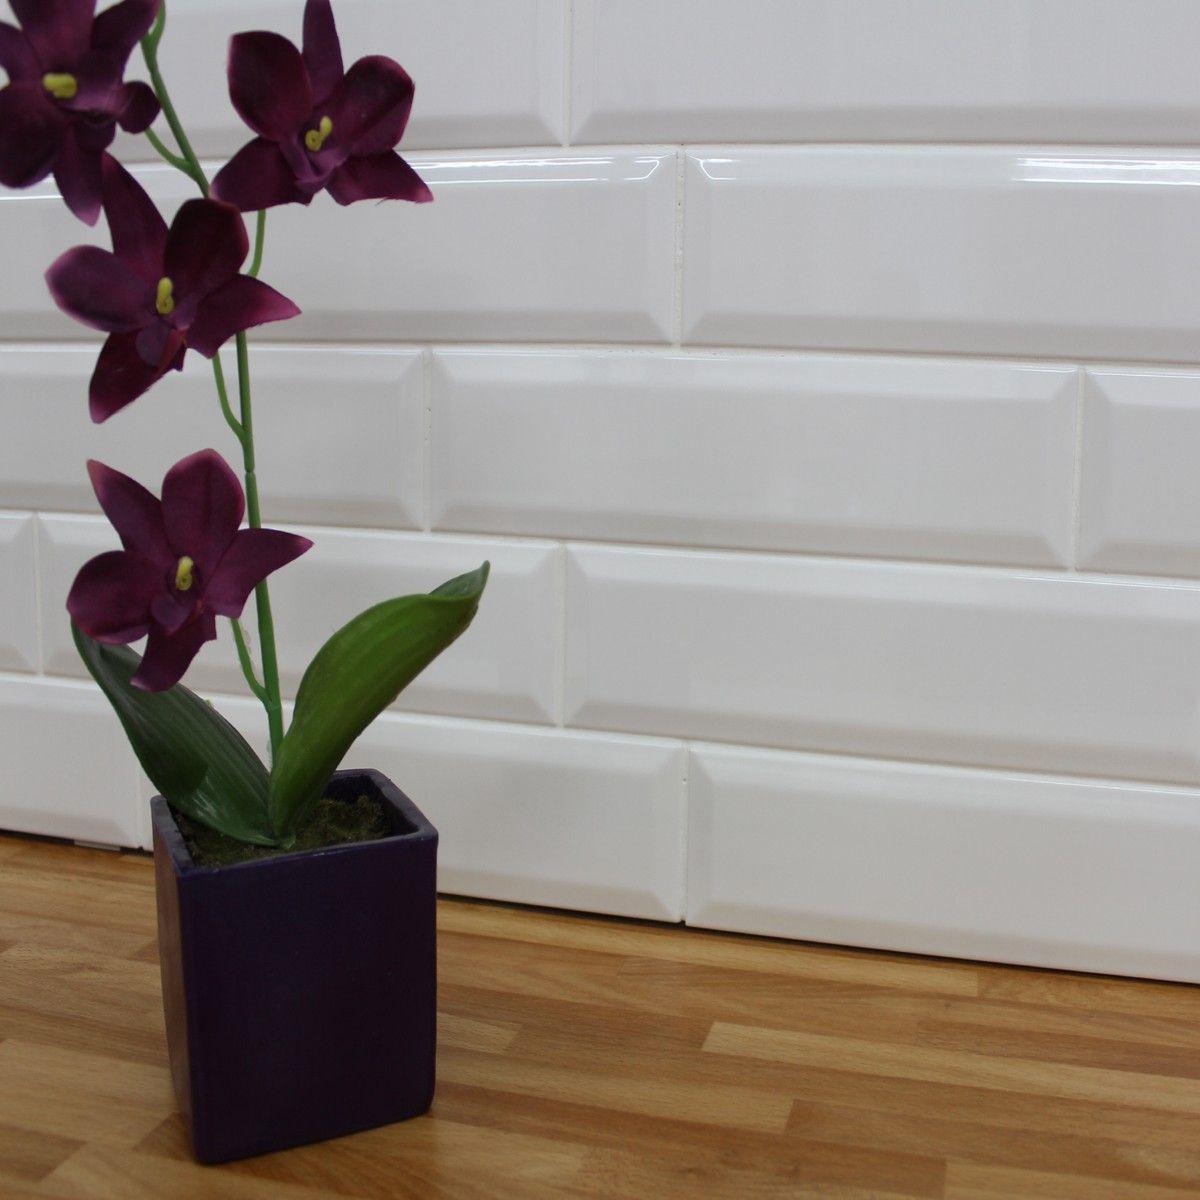 White Kitchen Wall Tiles kensington white kitchen wall tiles | splash backs | pinterest